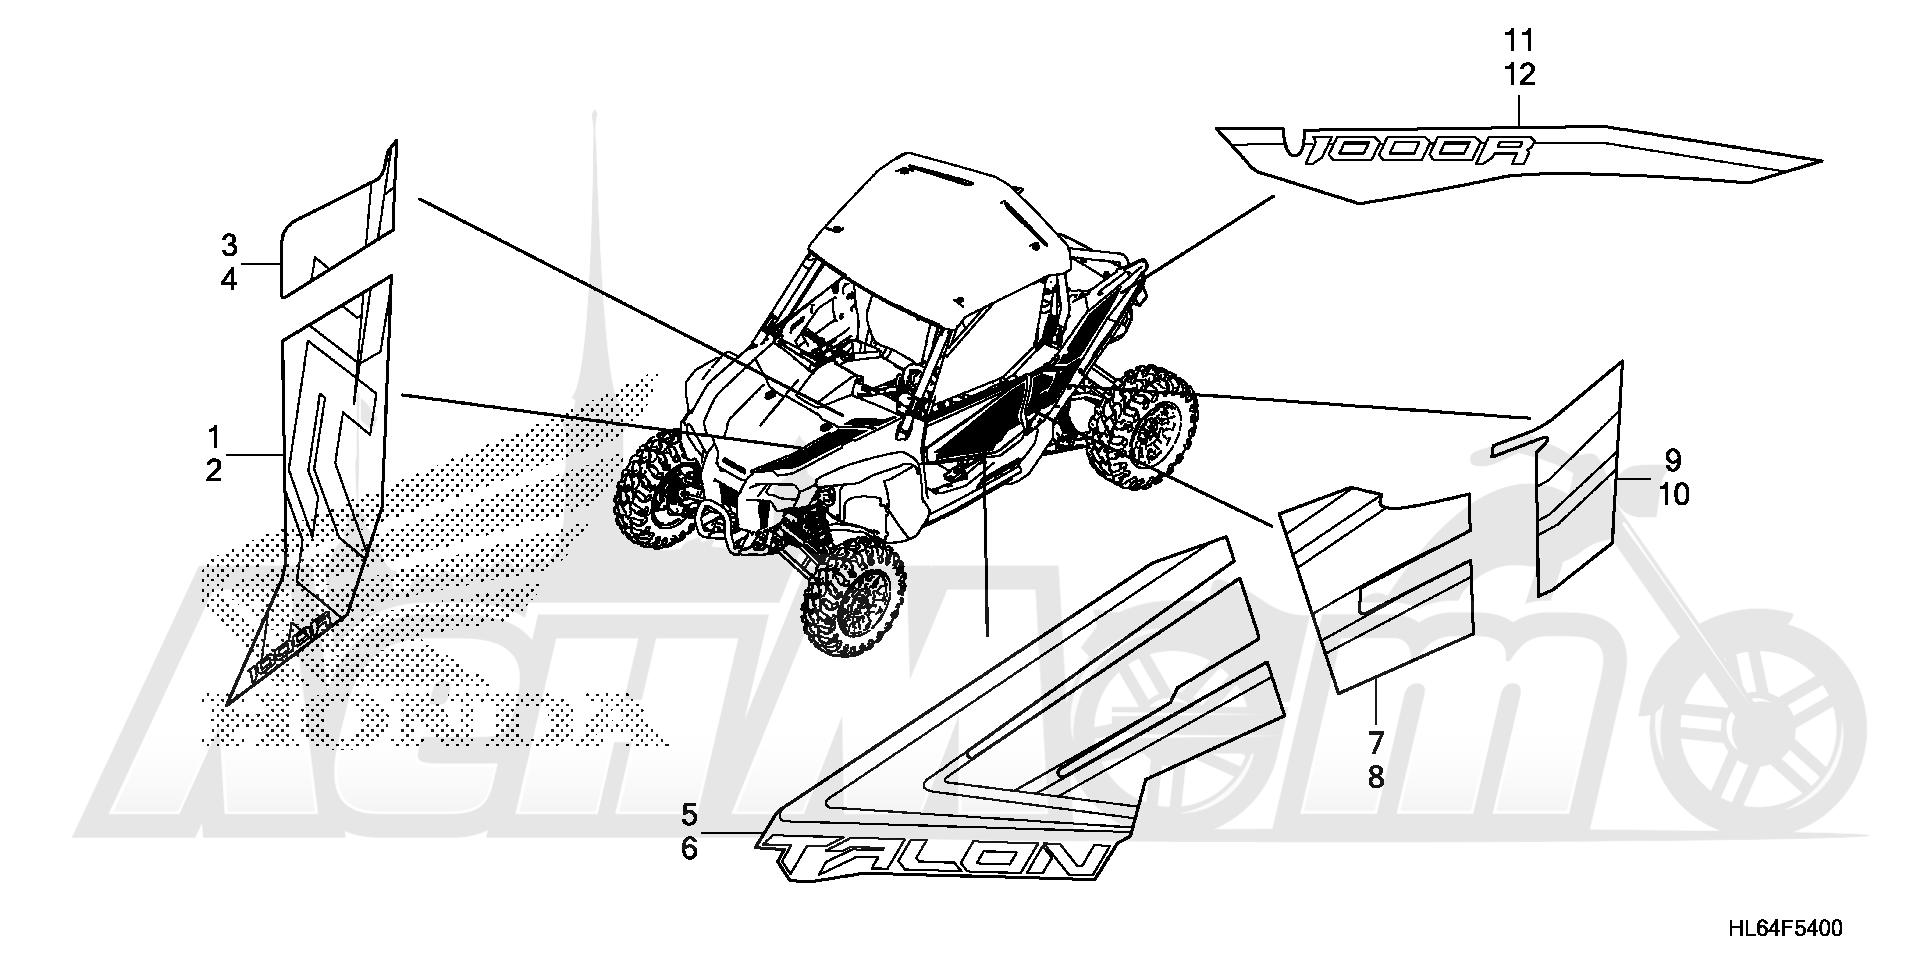 Запчасти для Квадроцикла Honda 2019 SXS1000S2X Раздел: MARK (1) | знак (1)